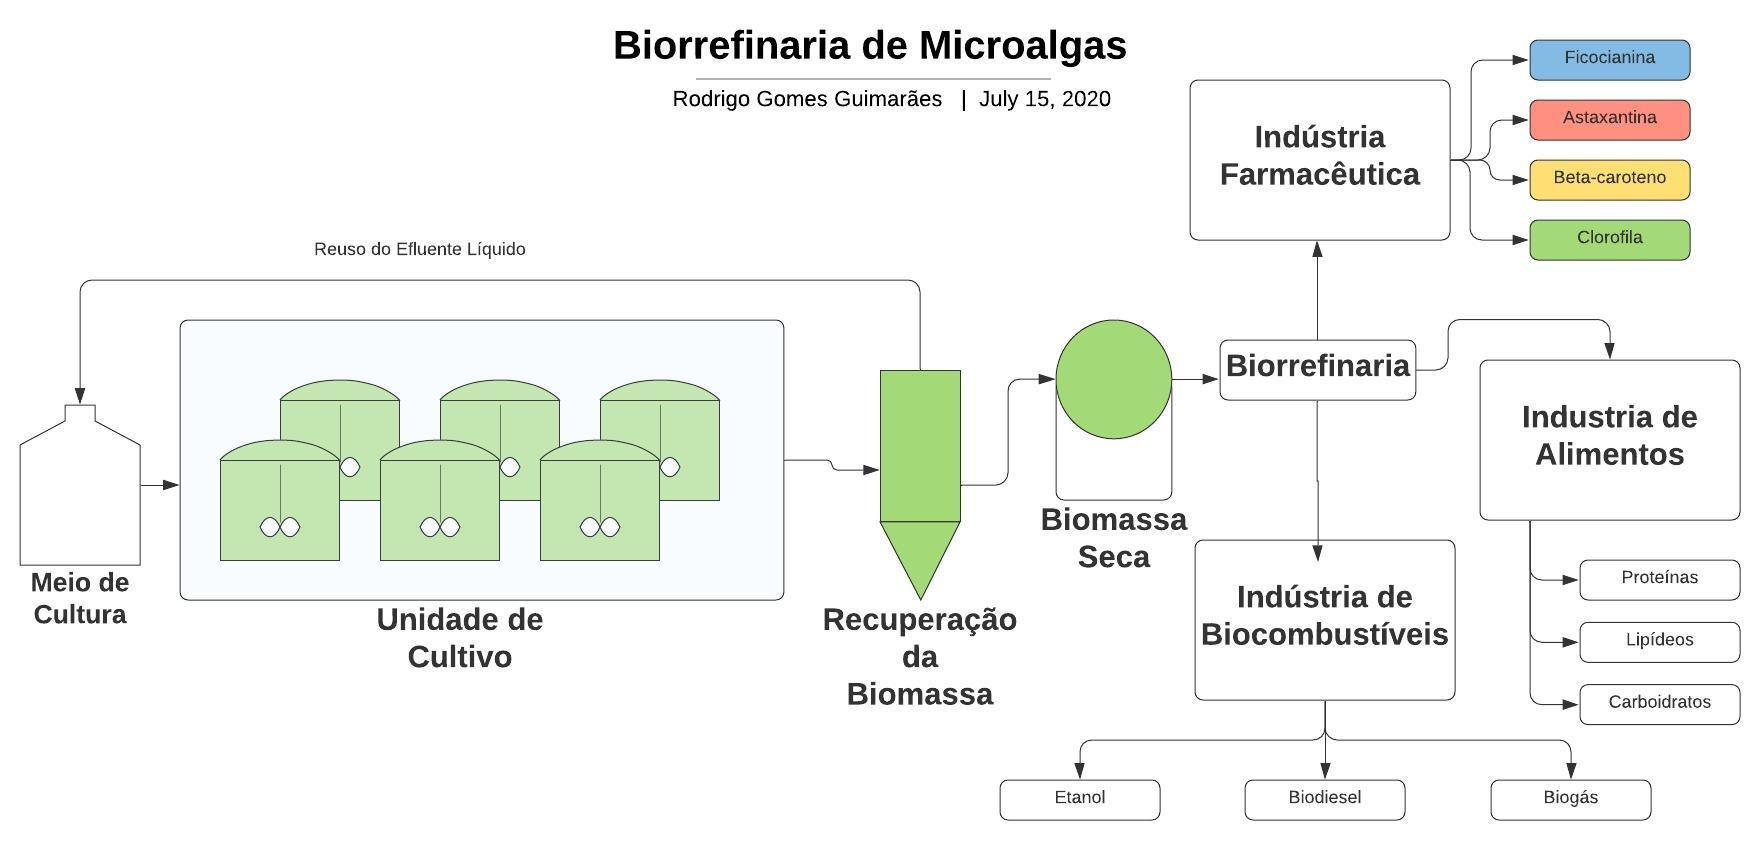 Biorrefinaria de Biomassa de Microalgas